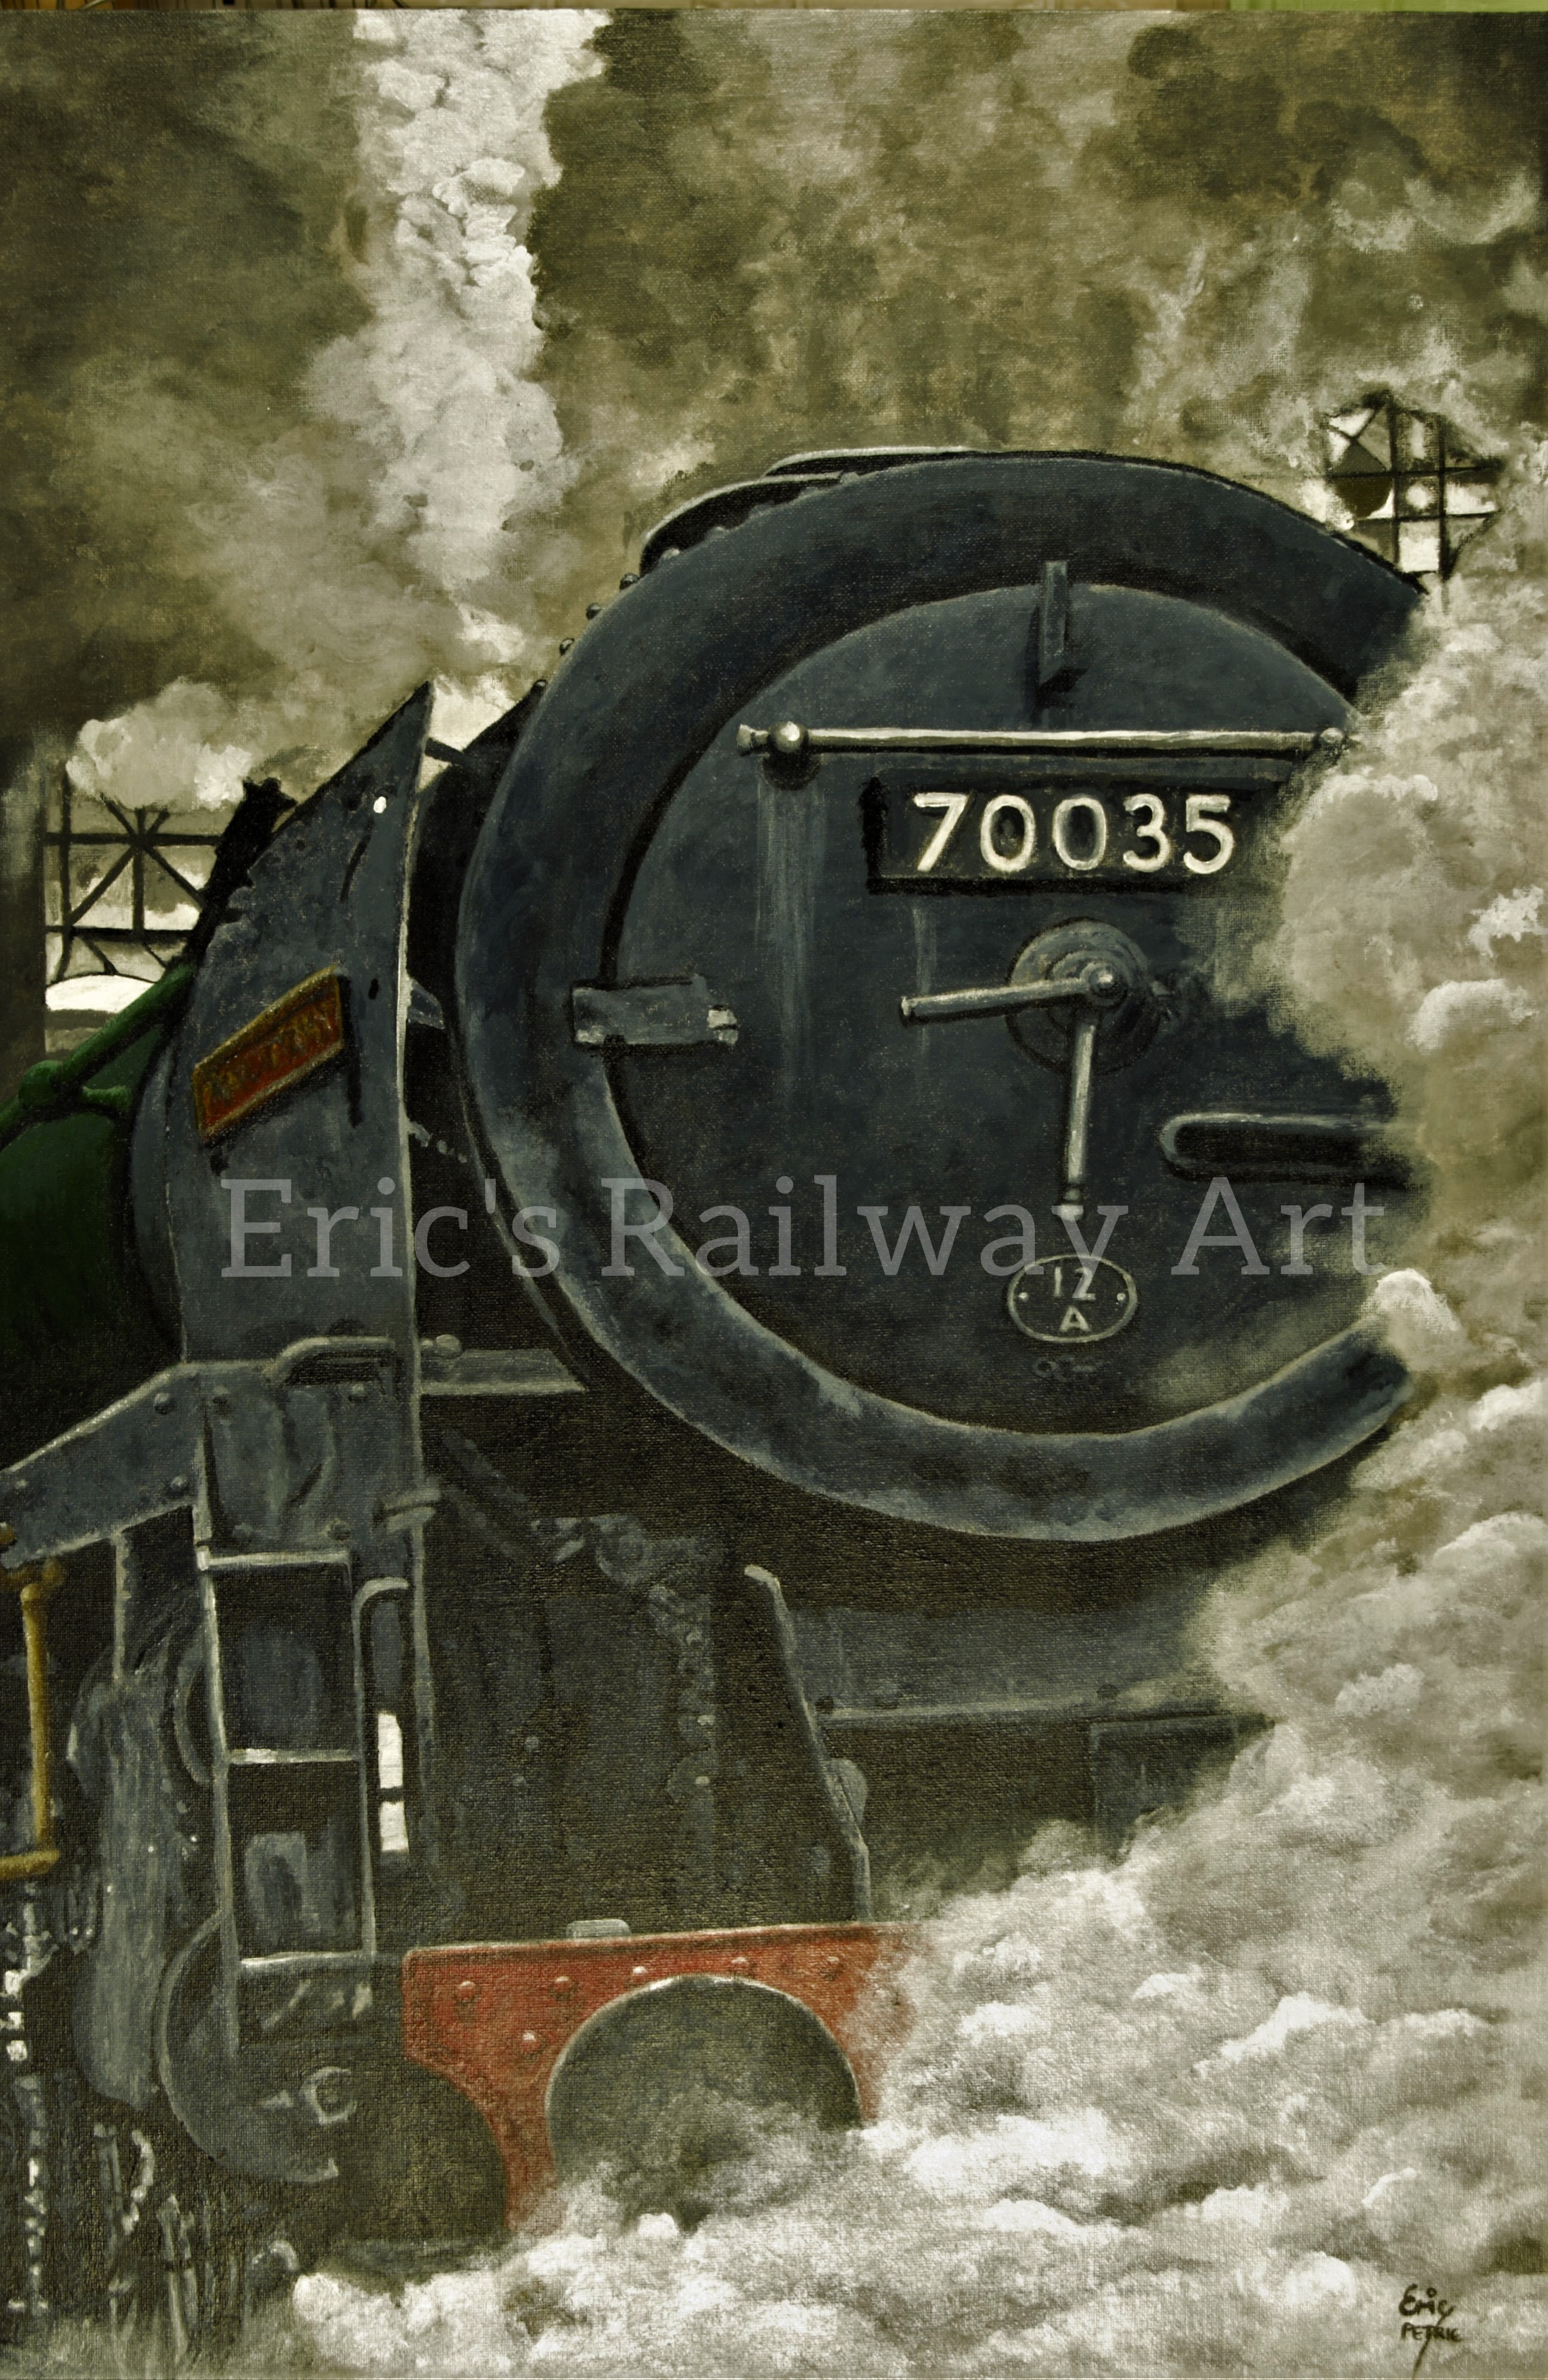 Eric's Railway Art - Rudyard Kipling